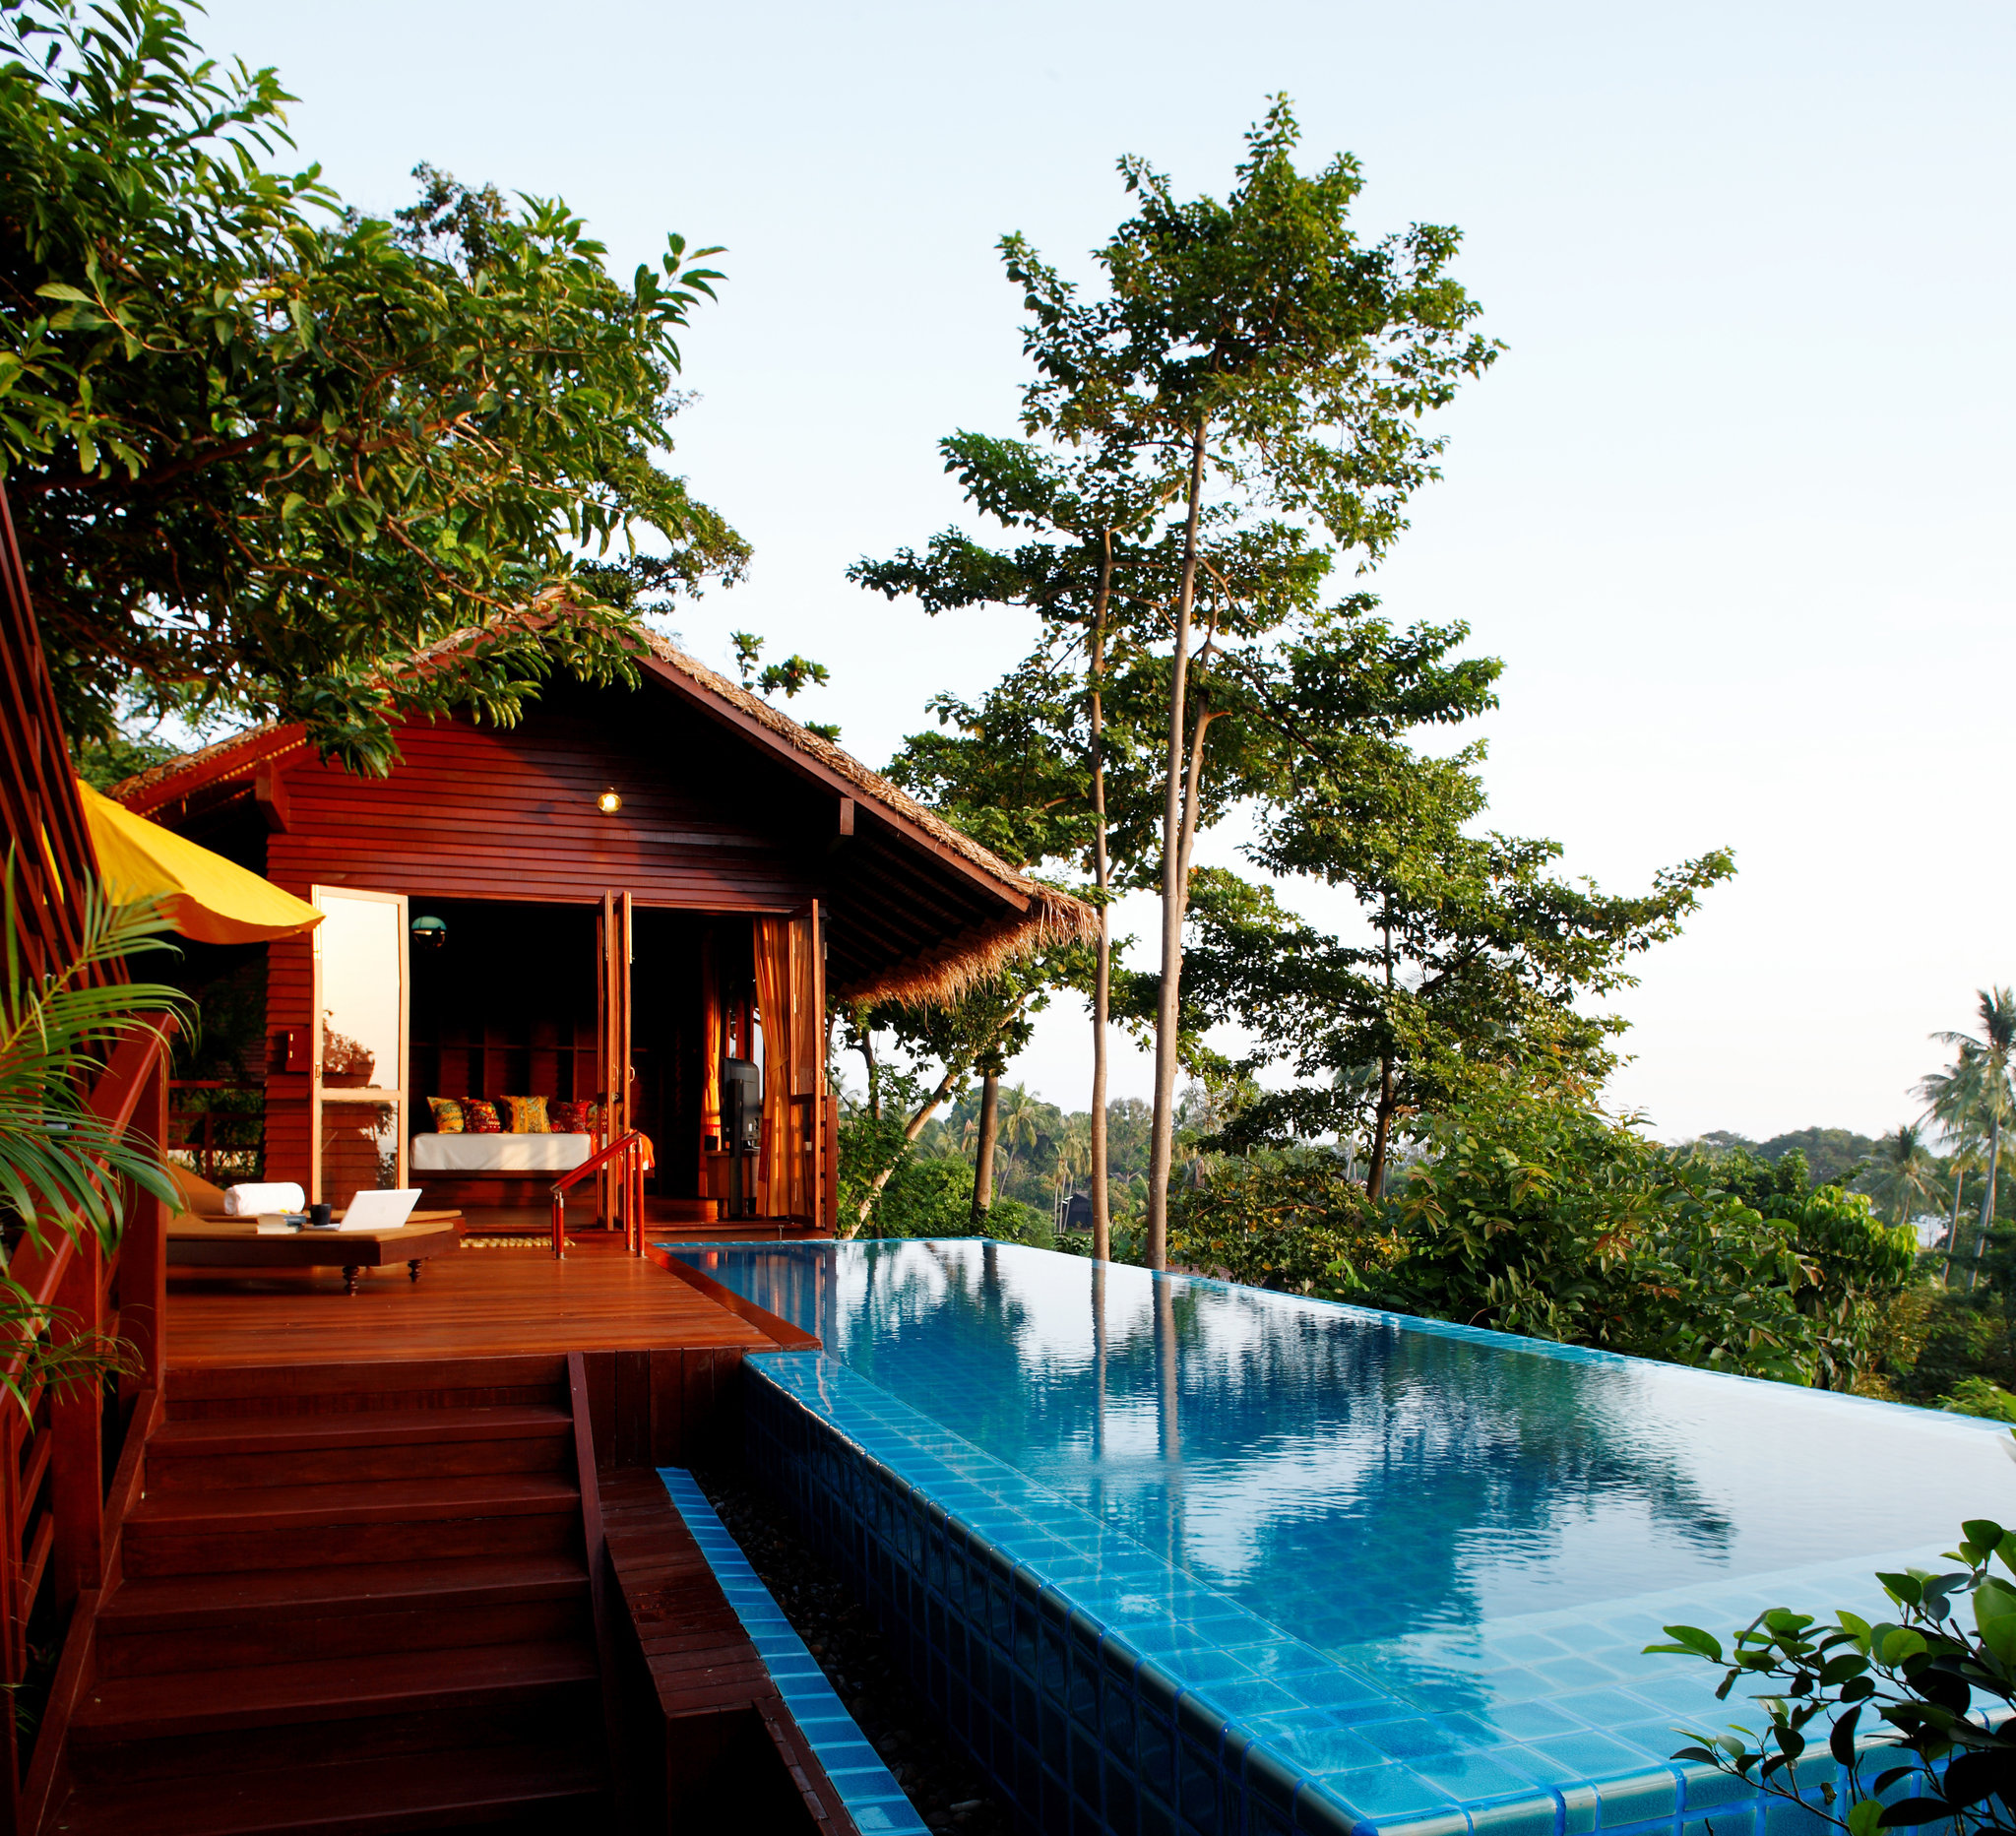 The Phi Phi Beach Resort Map: Zeavola, Luxury Hotel Koh Phi Phi, Thailand